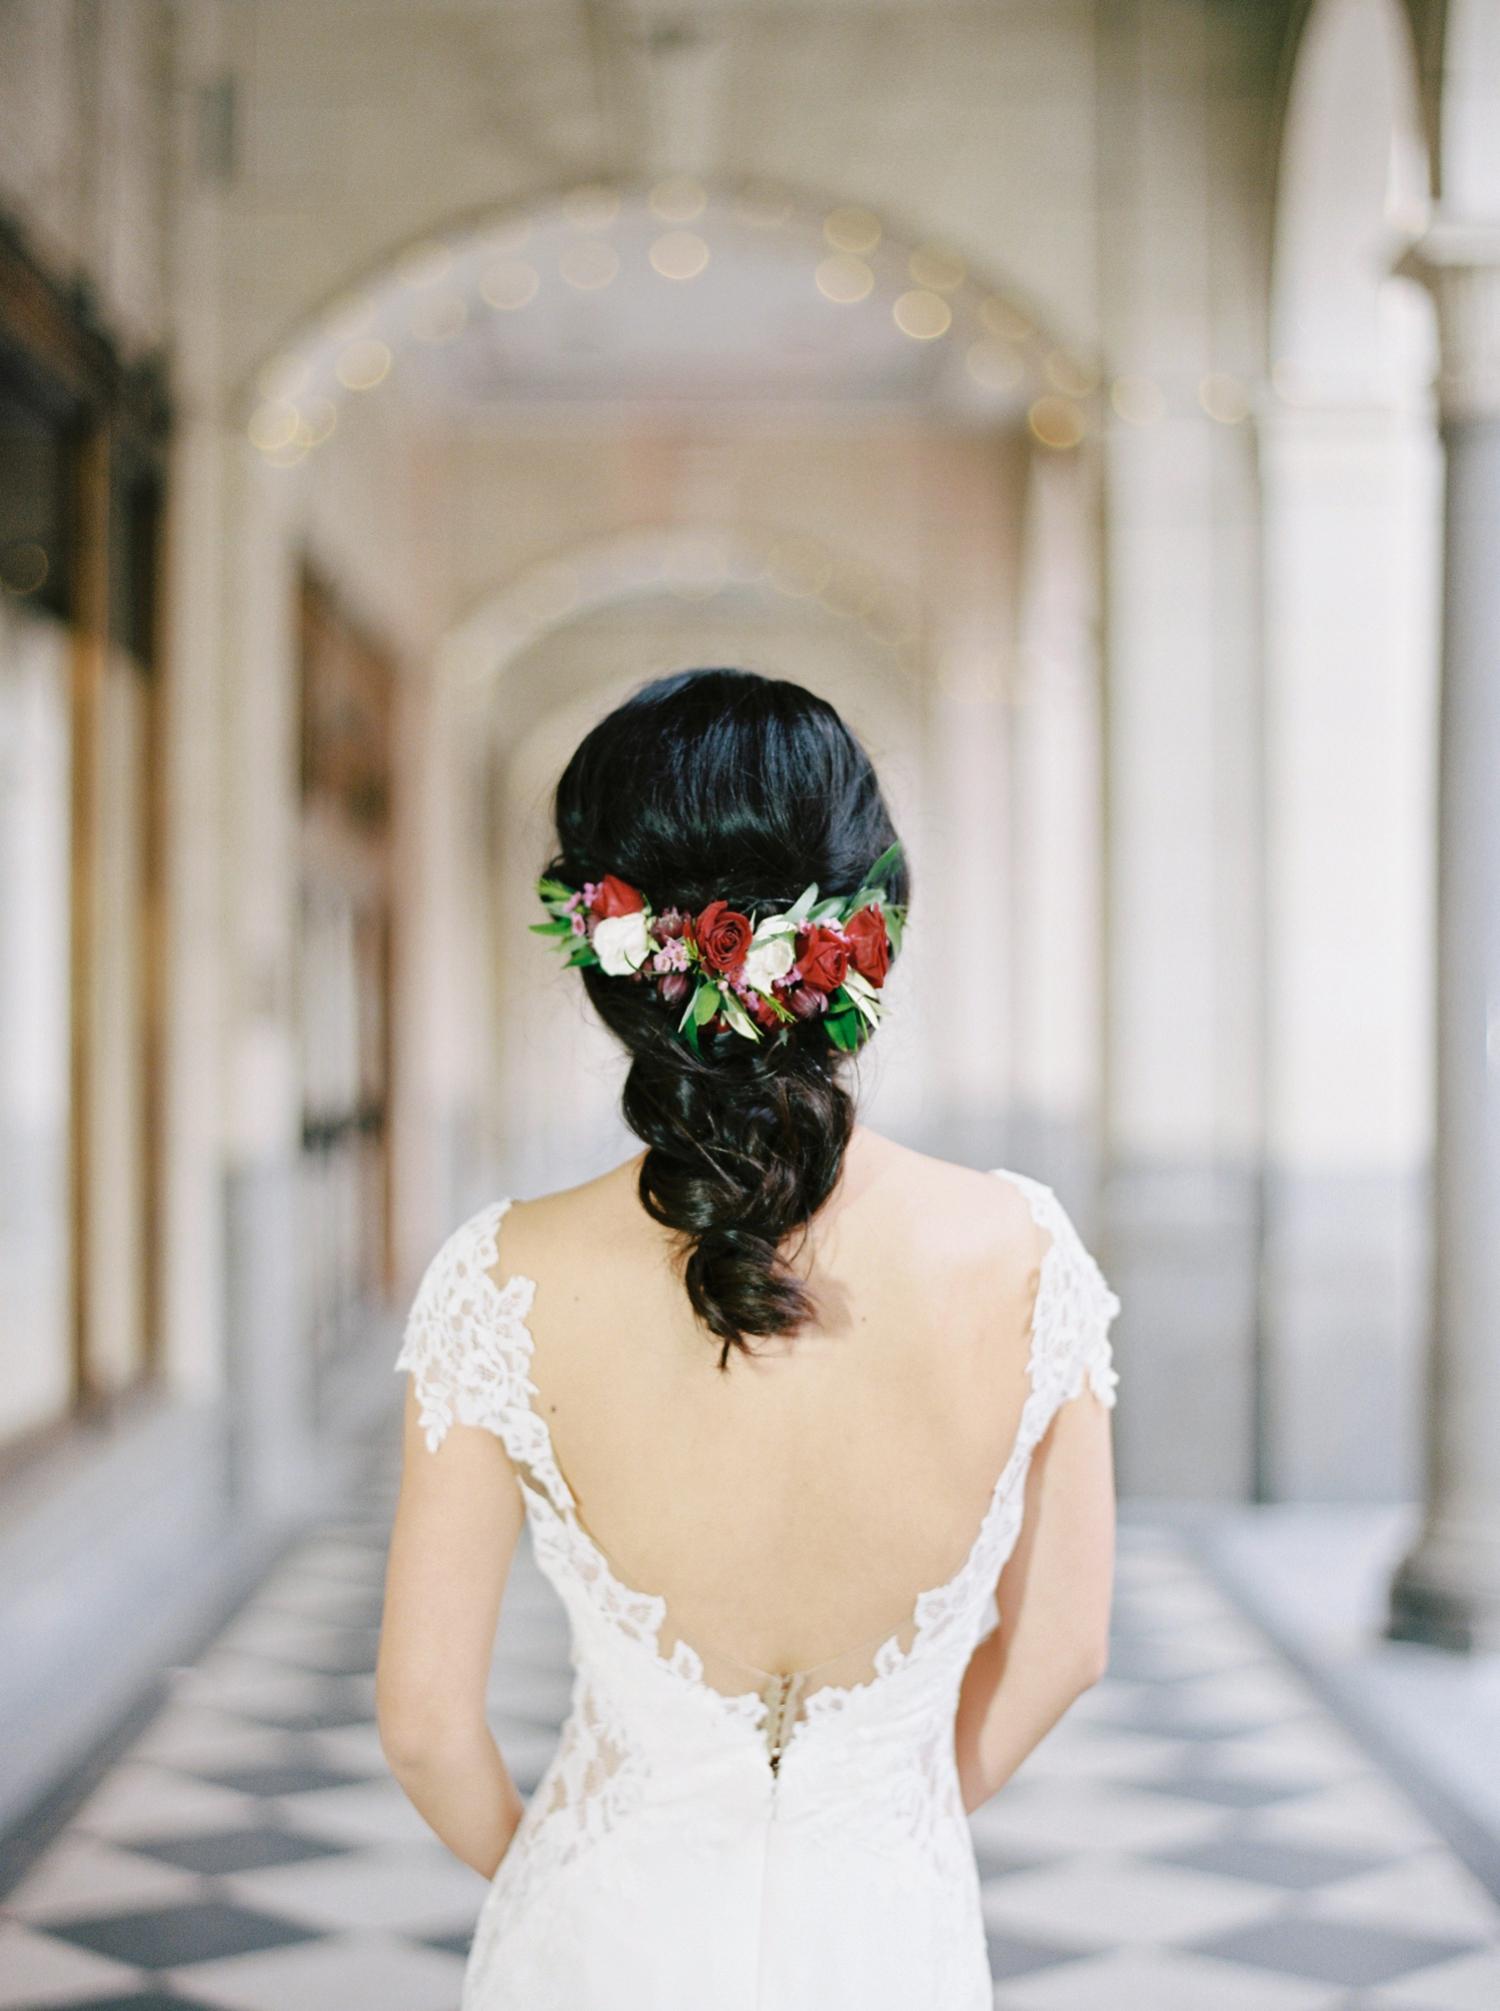 Calgary wedding photographer | fine art film photography | Calgary Wedding Photographers | Justine Milton Photography | workshop wedding | bride hairstyle | wedding dress